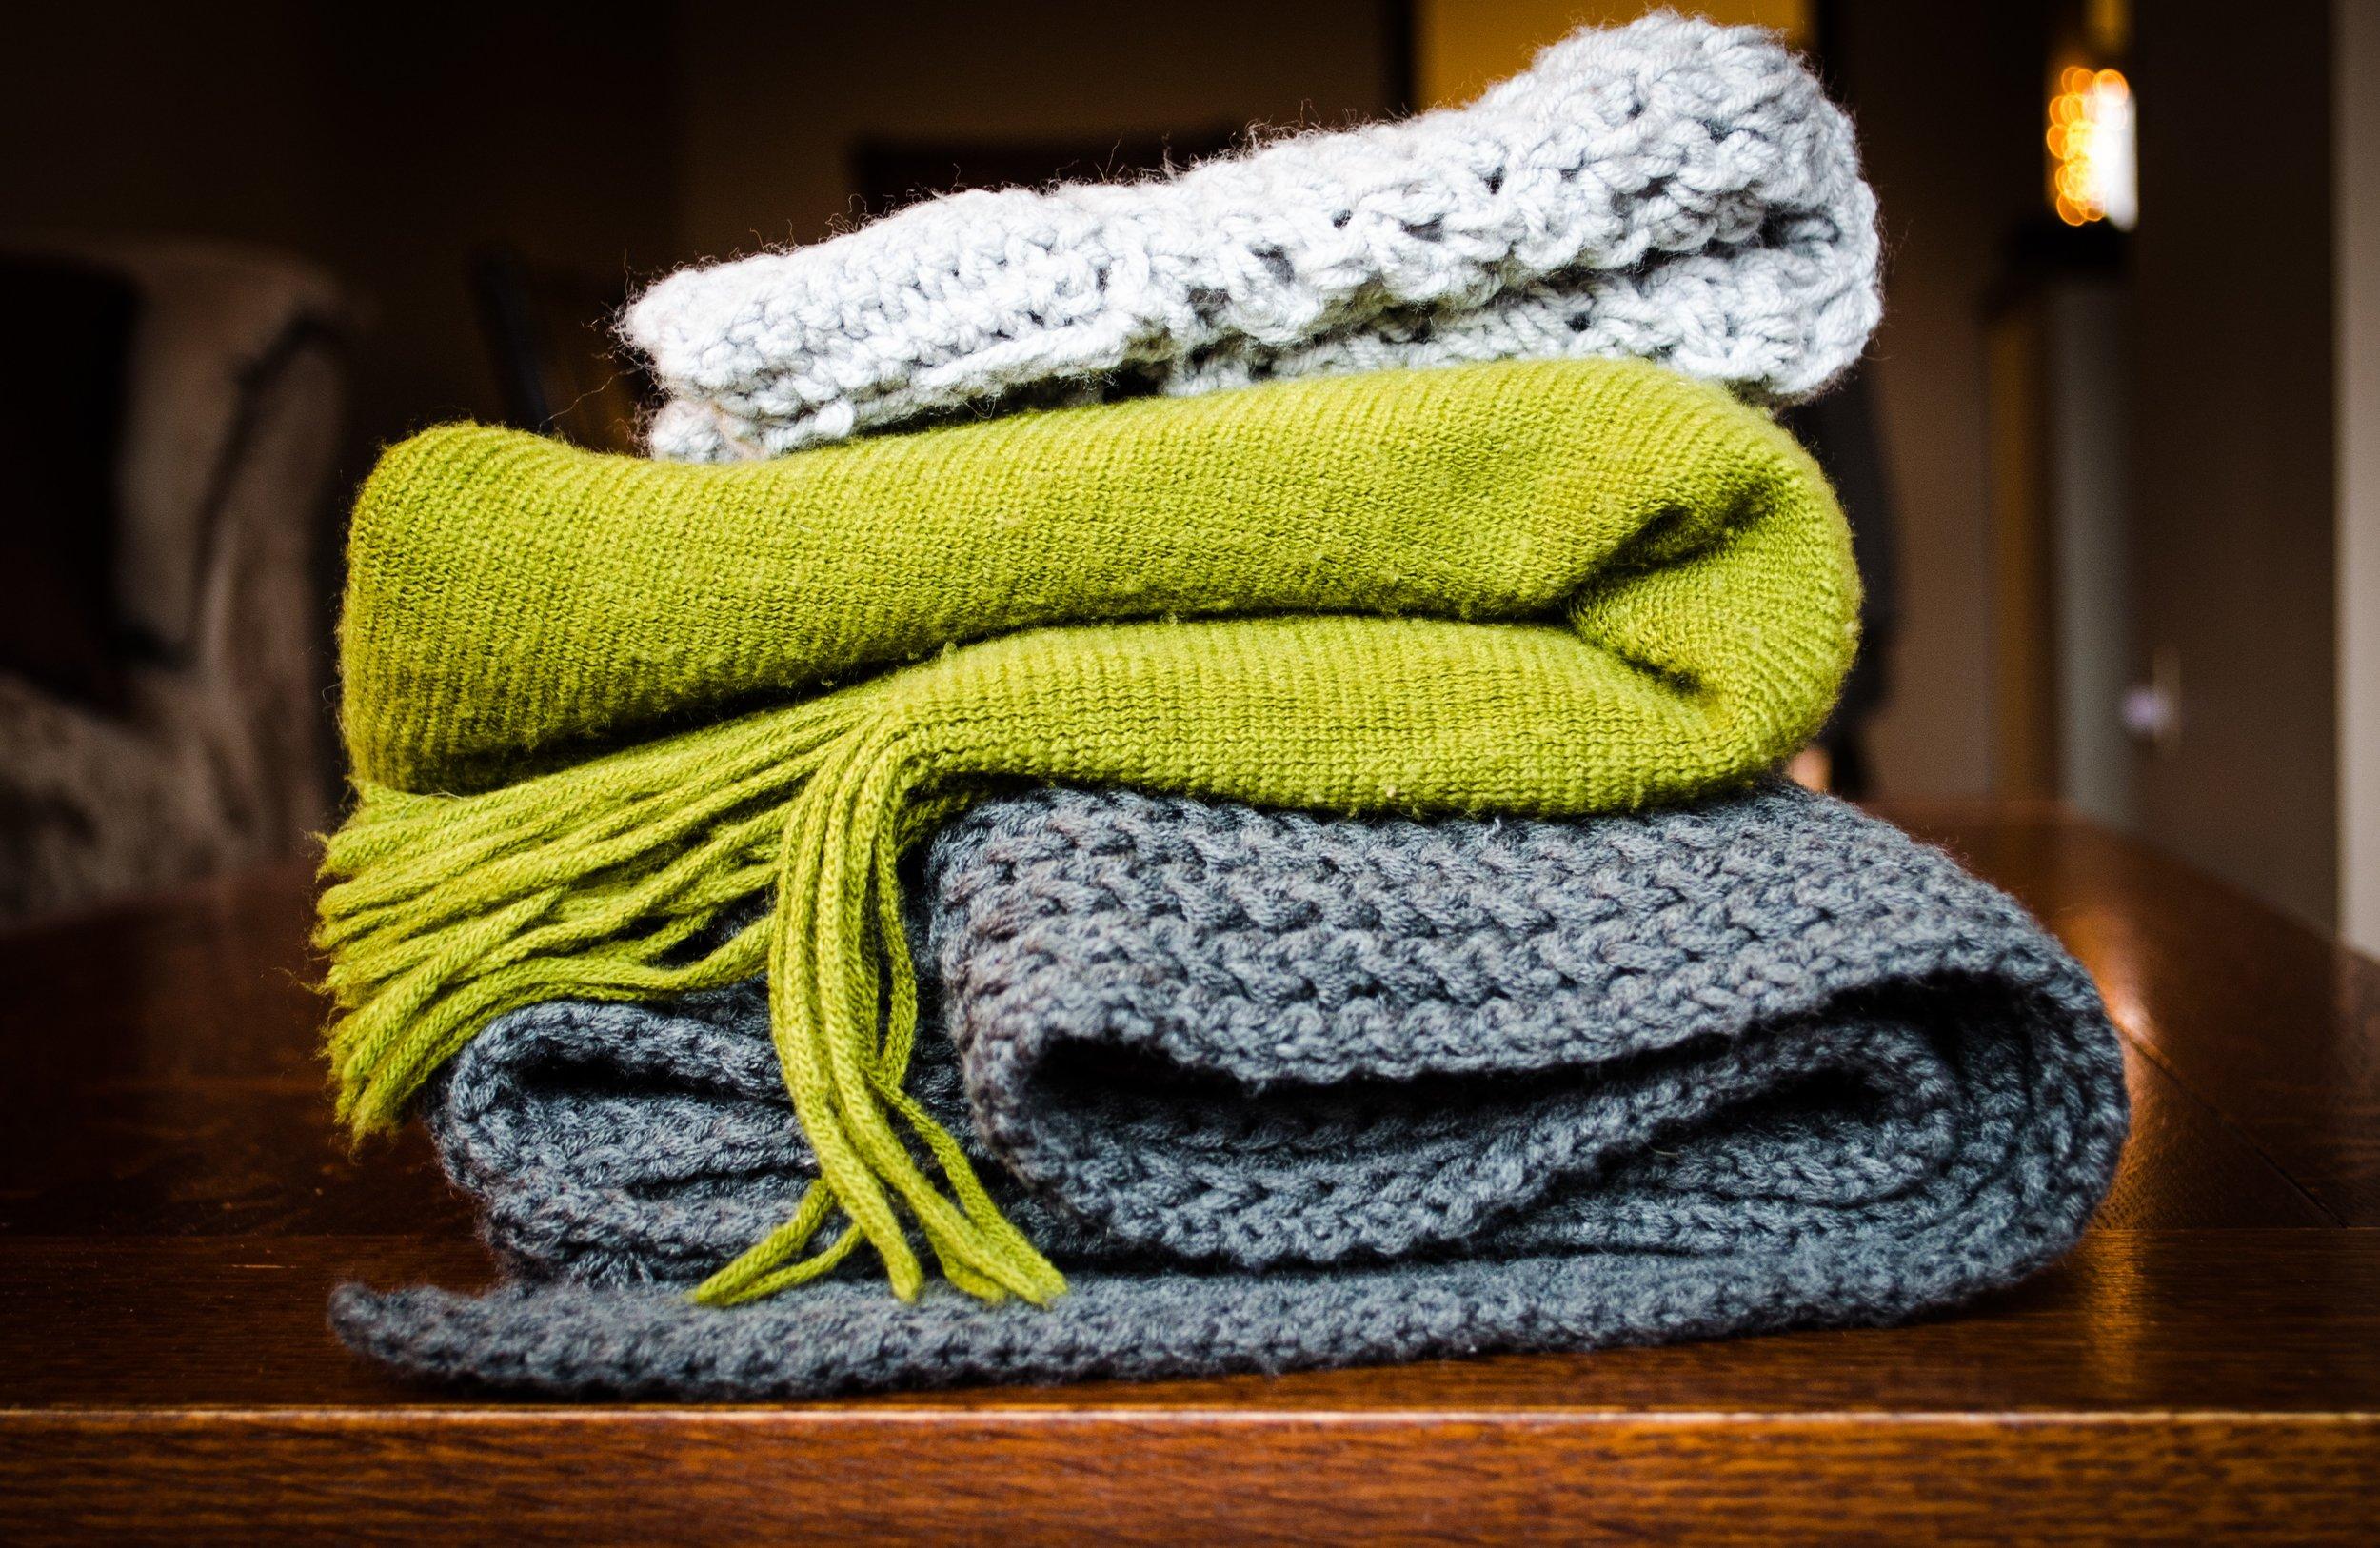 blankets.jpeg